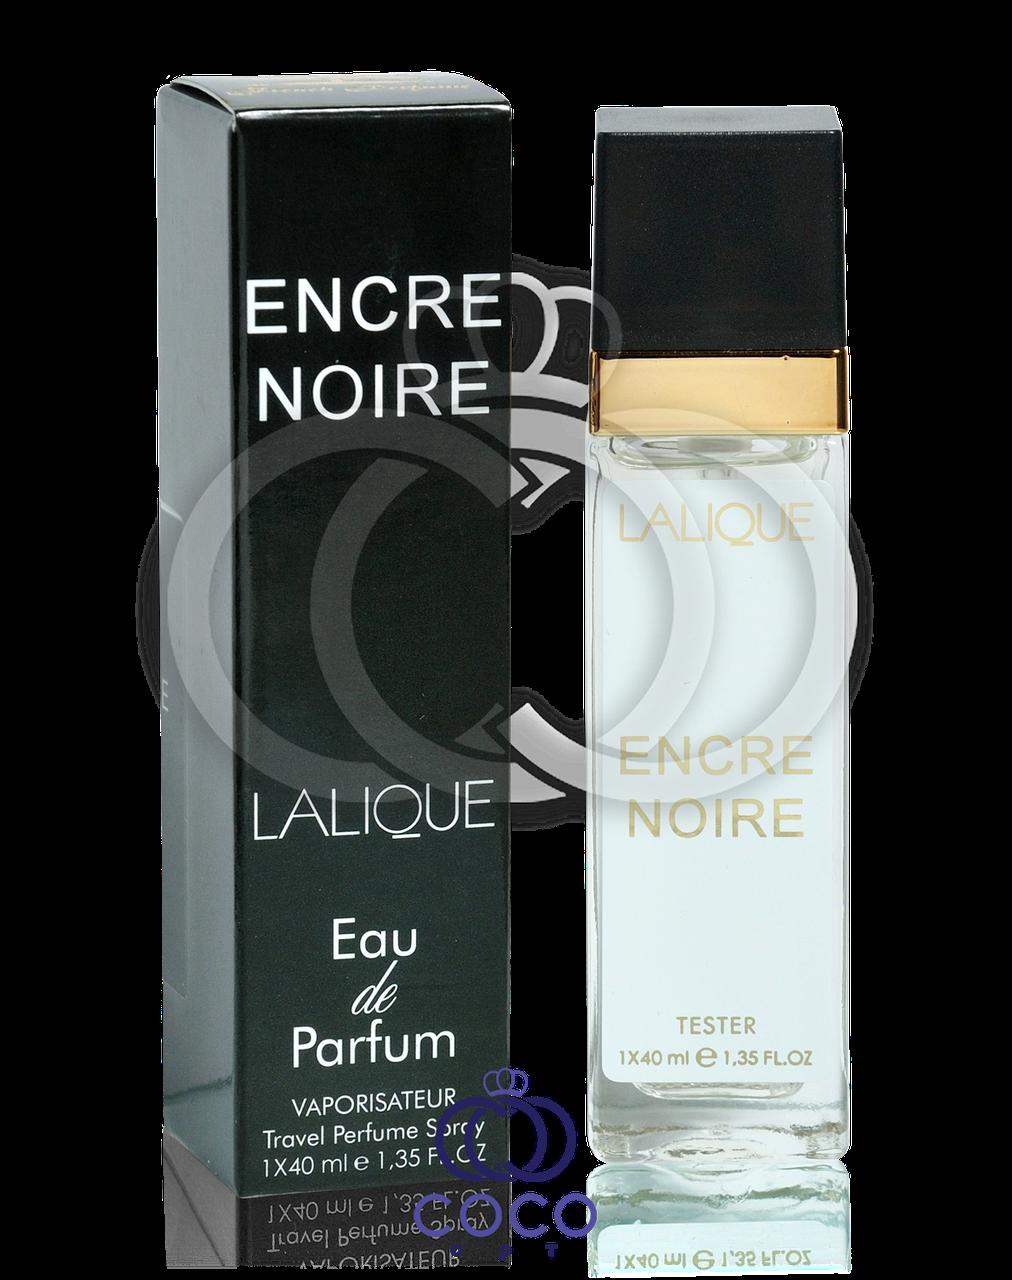 Мужской мини парфюм Lalique Encre Noire (тестер) 40 мл